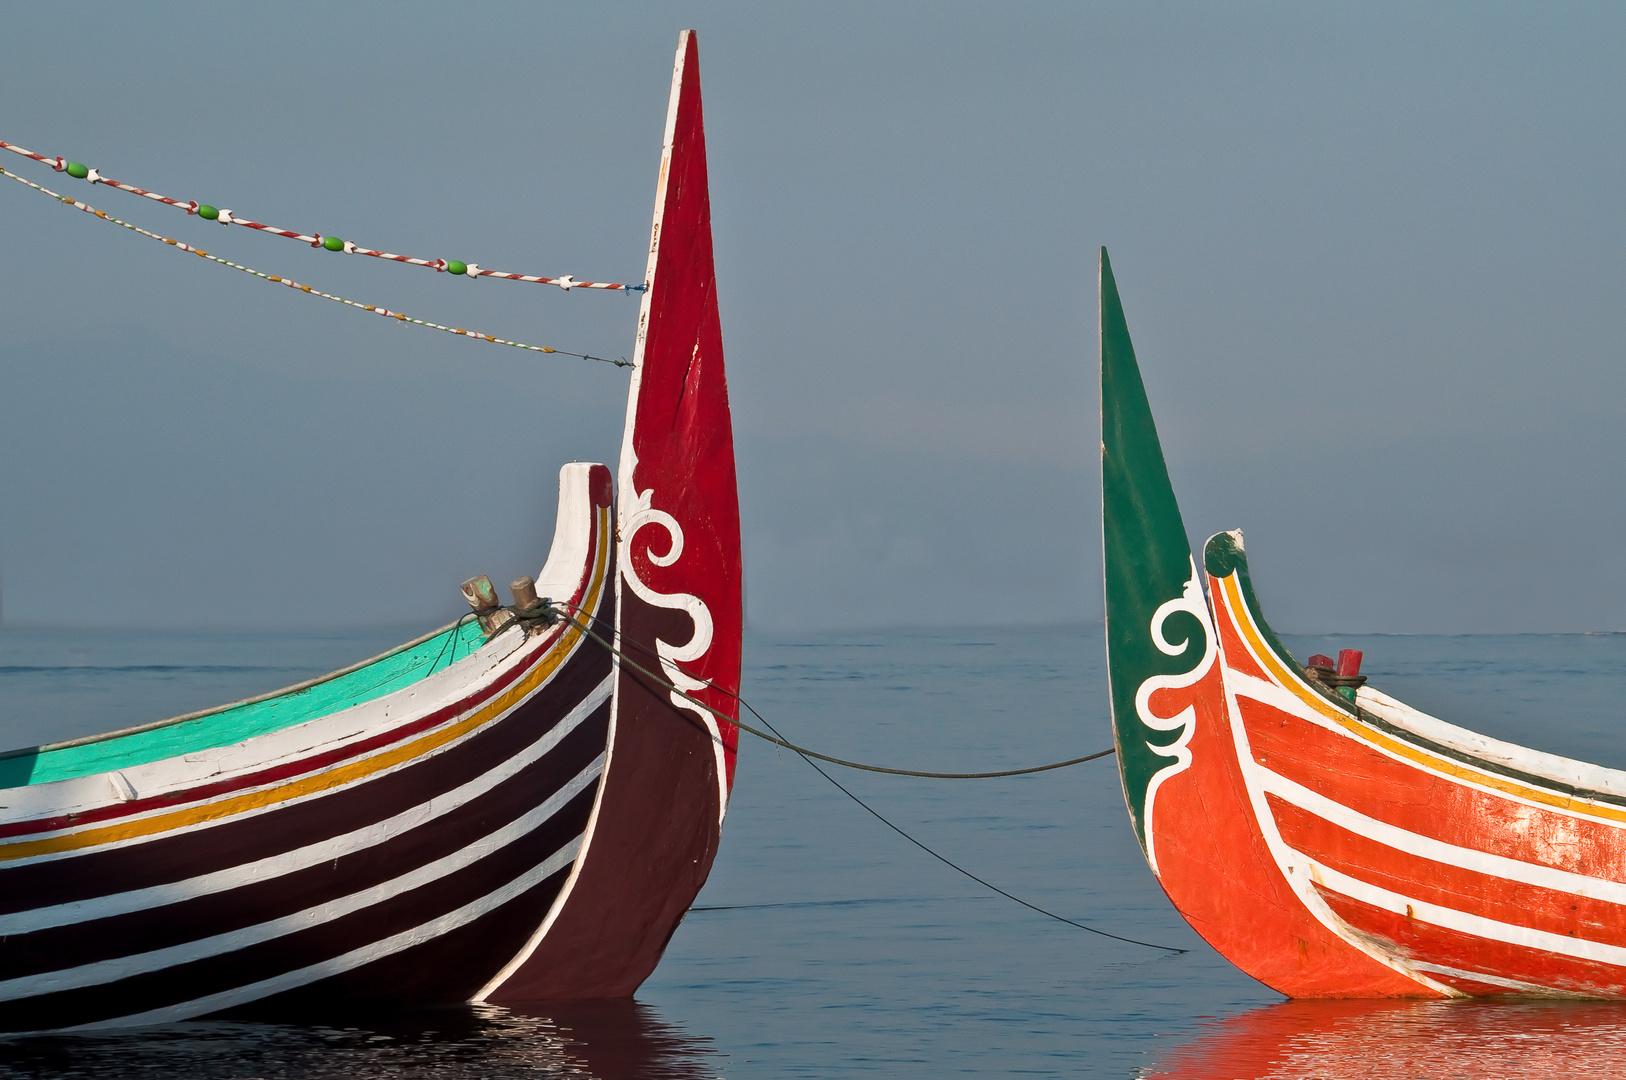 Balinesische Fischerboote